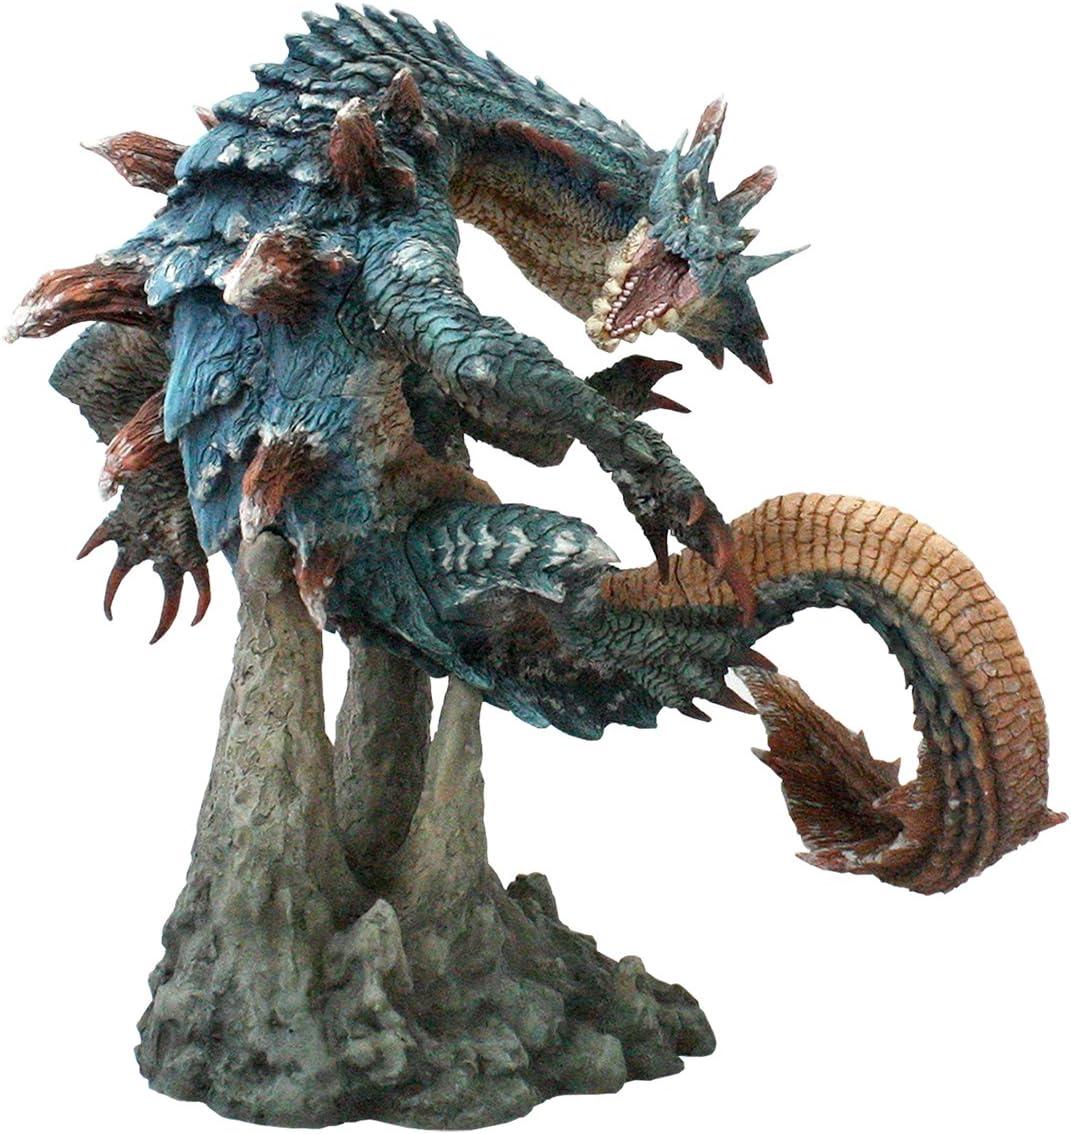 Monster Hunter Pvc Statue Cfb Creators Model Lagiacrus Resell Version 17 Cm Amazon Co Uk Toys Games